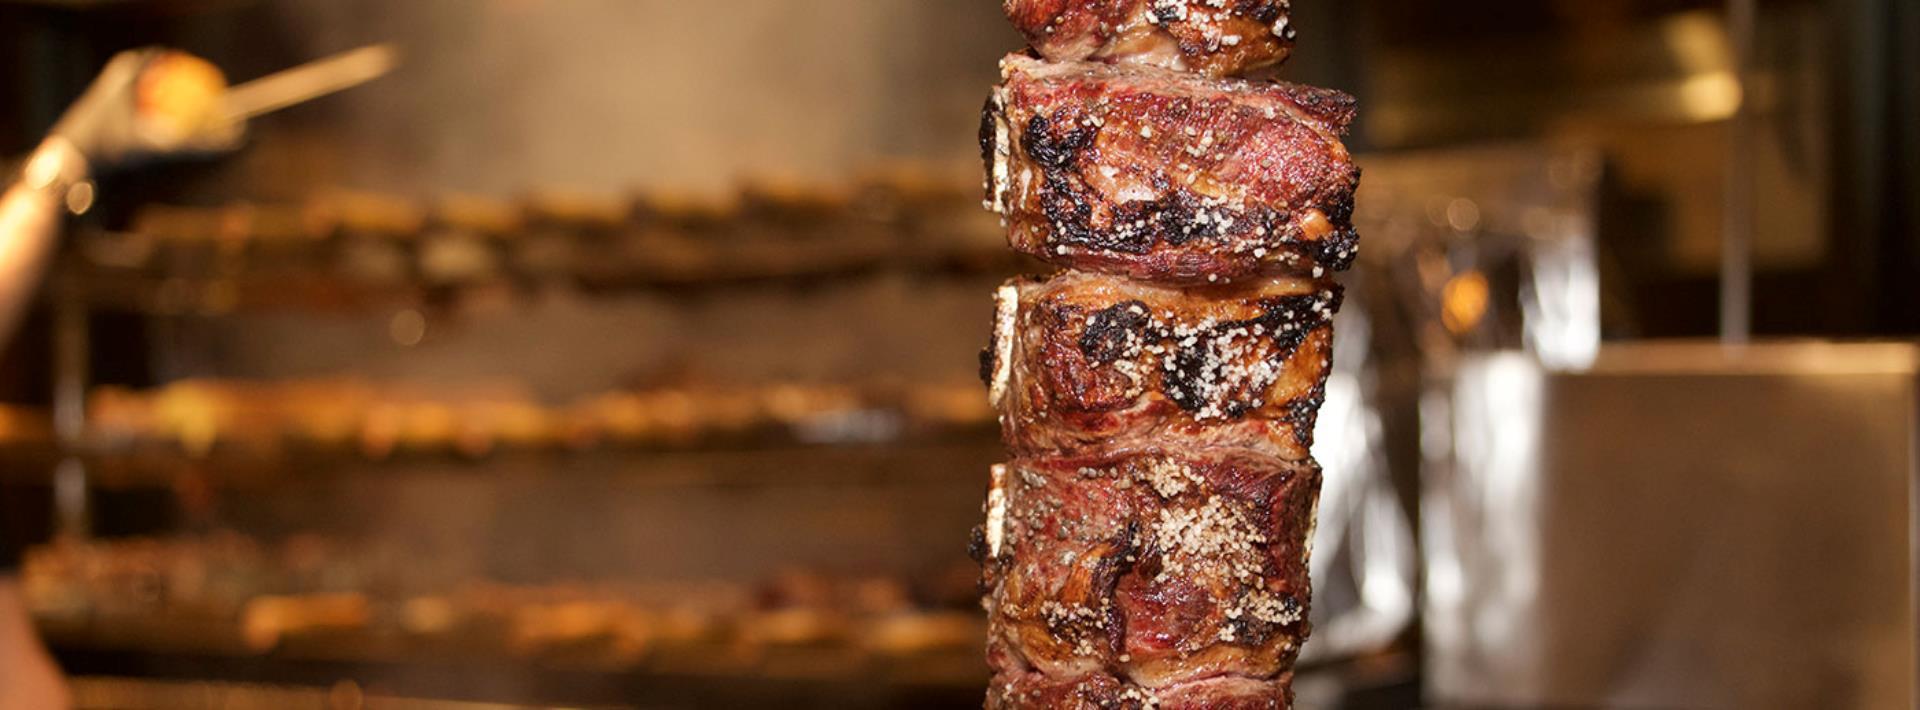 Carnaval Brazilian BBQ Restaurant - Picture